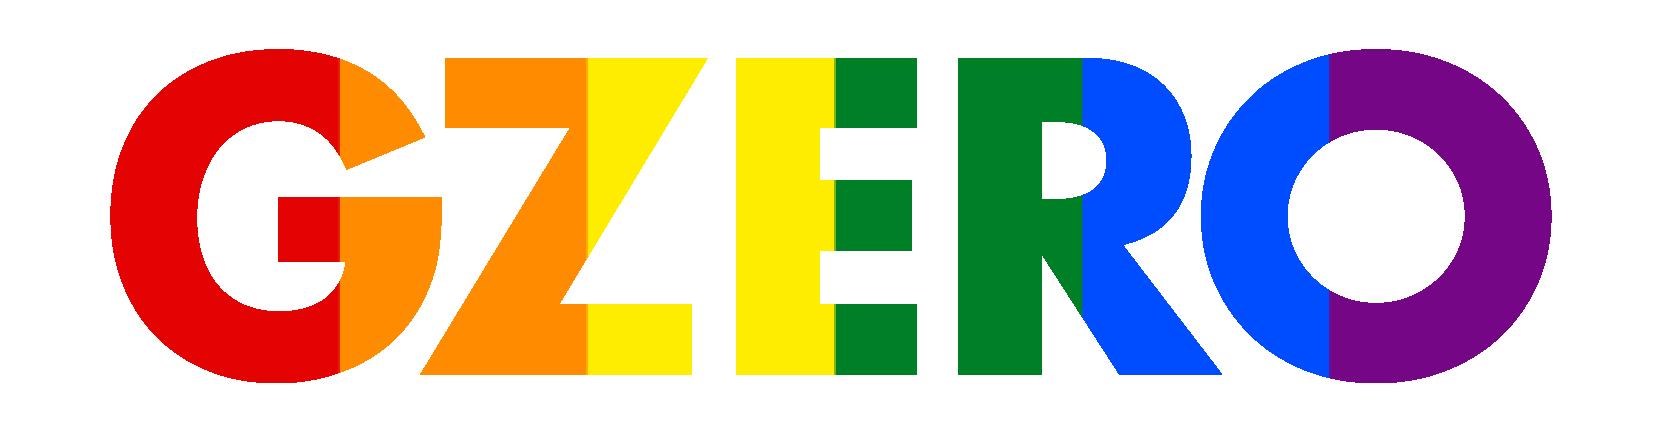 GZERO Media logo